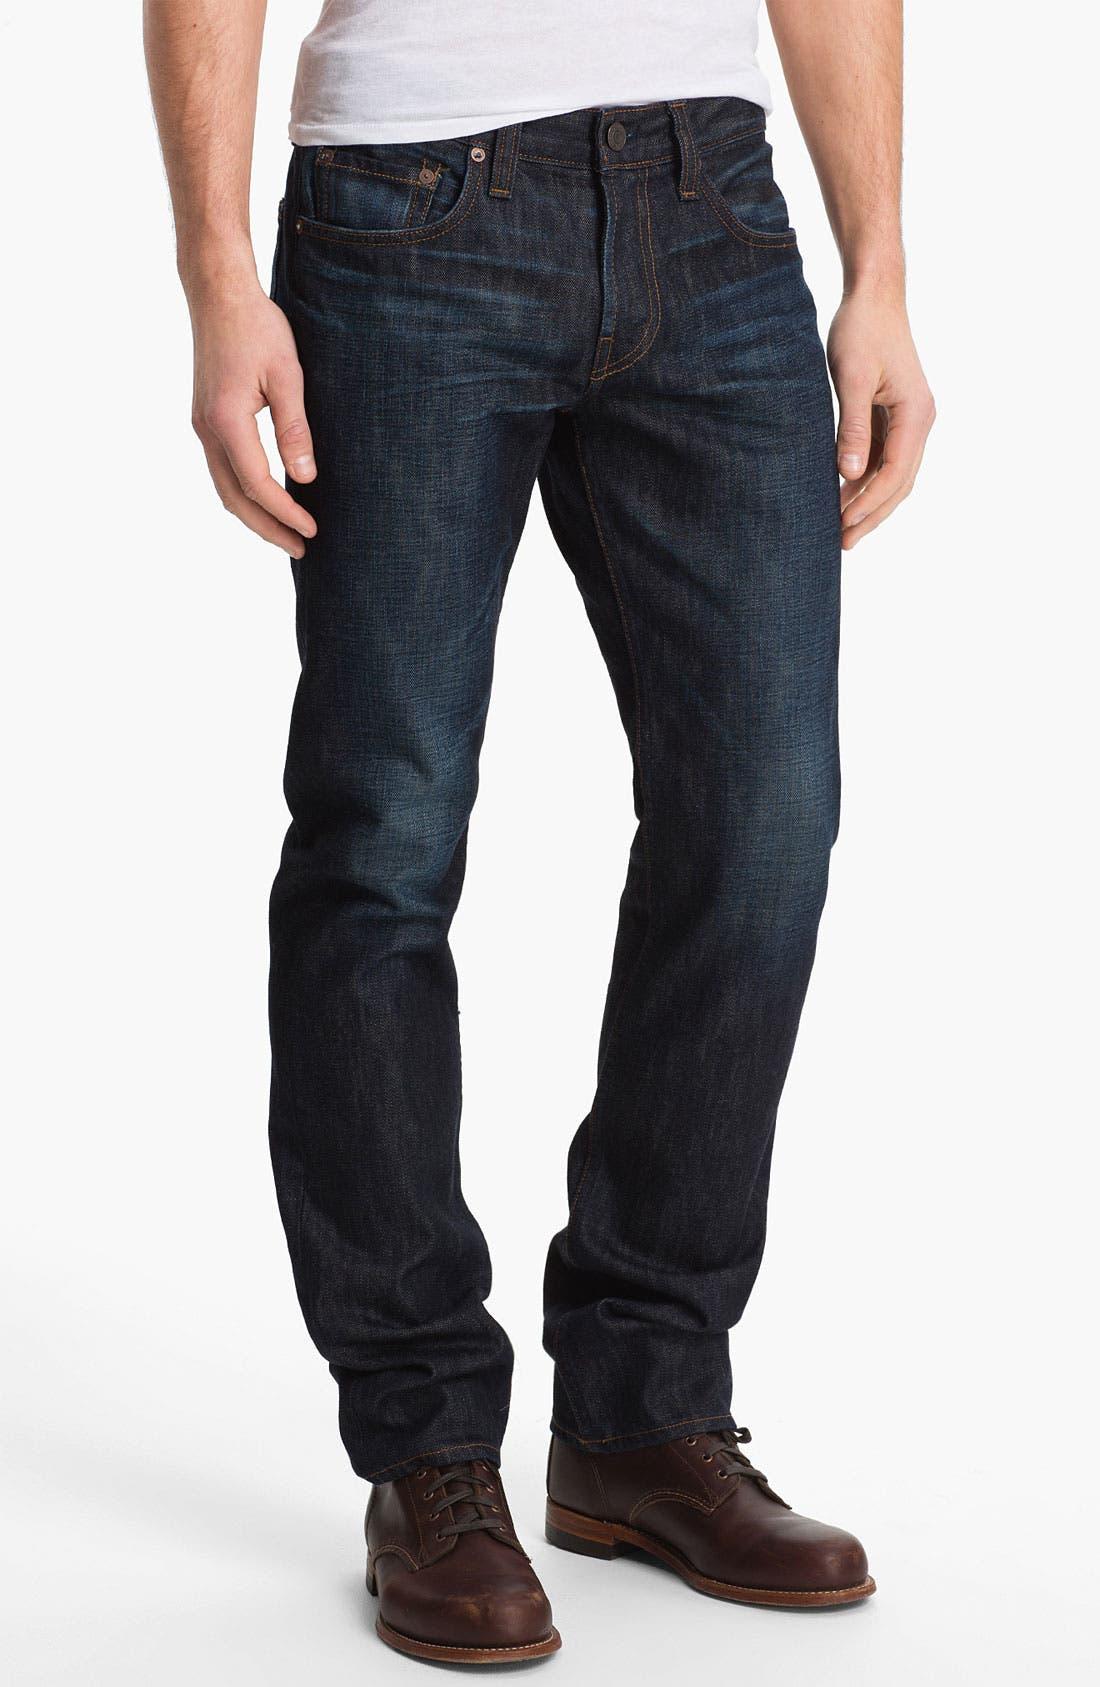 Alternate Image 1 Selected - J Brand 'Kane' Slim Fit Jeans (Atom)